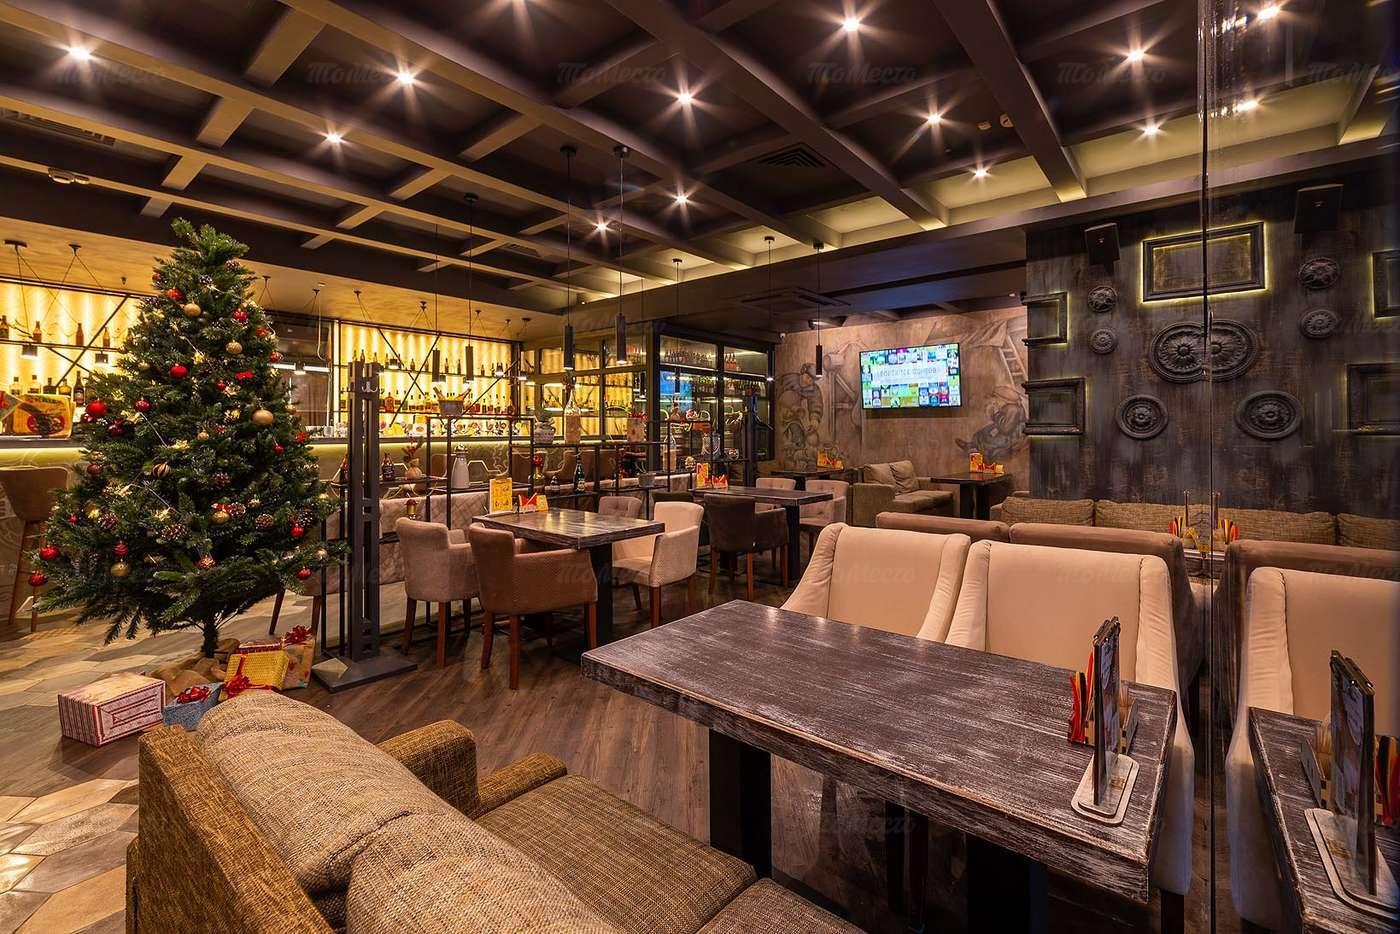 Ресторан Брассерия Крик (Brasserie Kriek) на Коломяжском проспекте фото 5